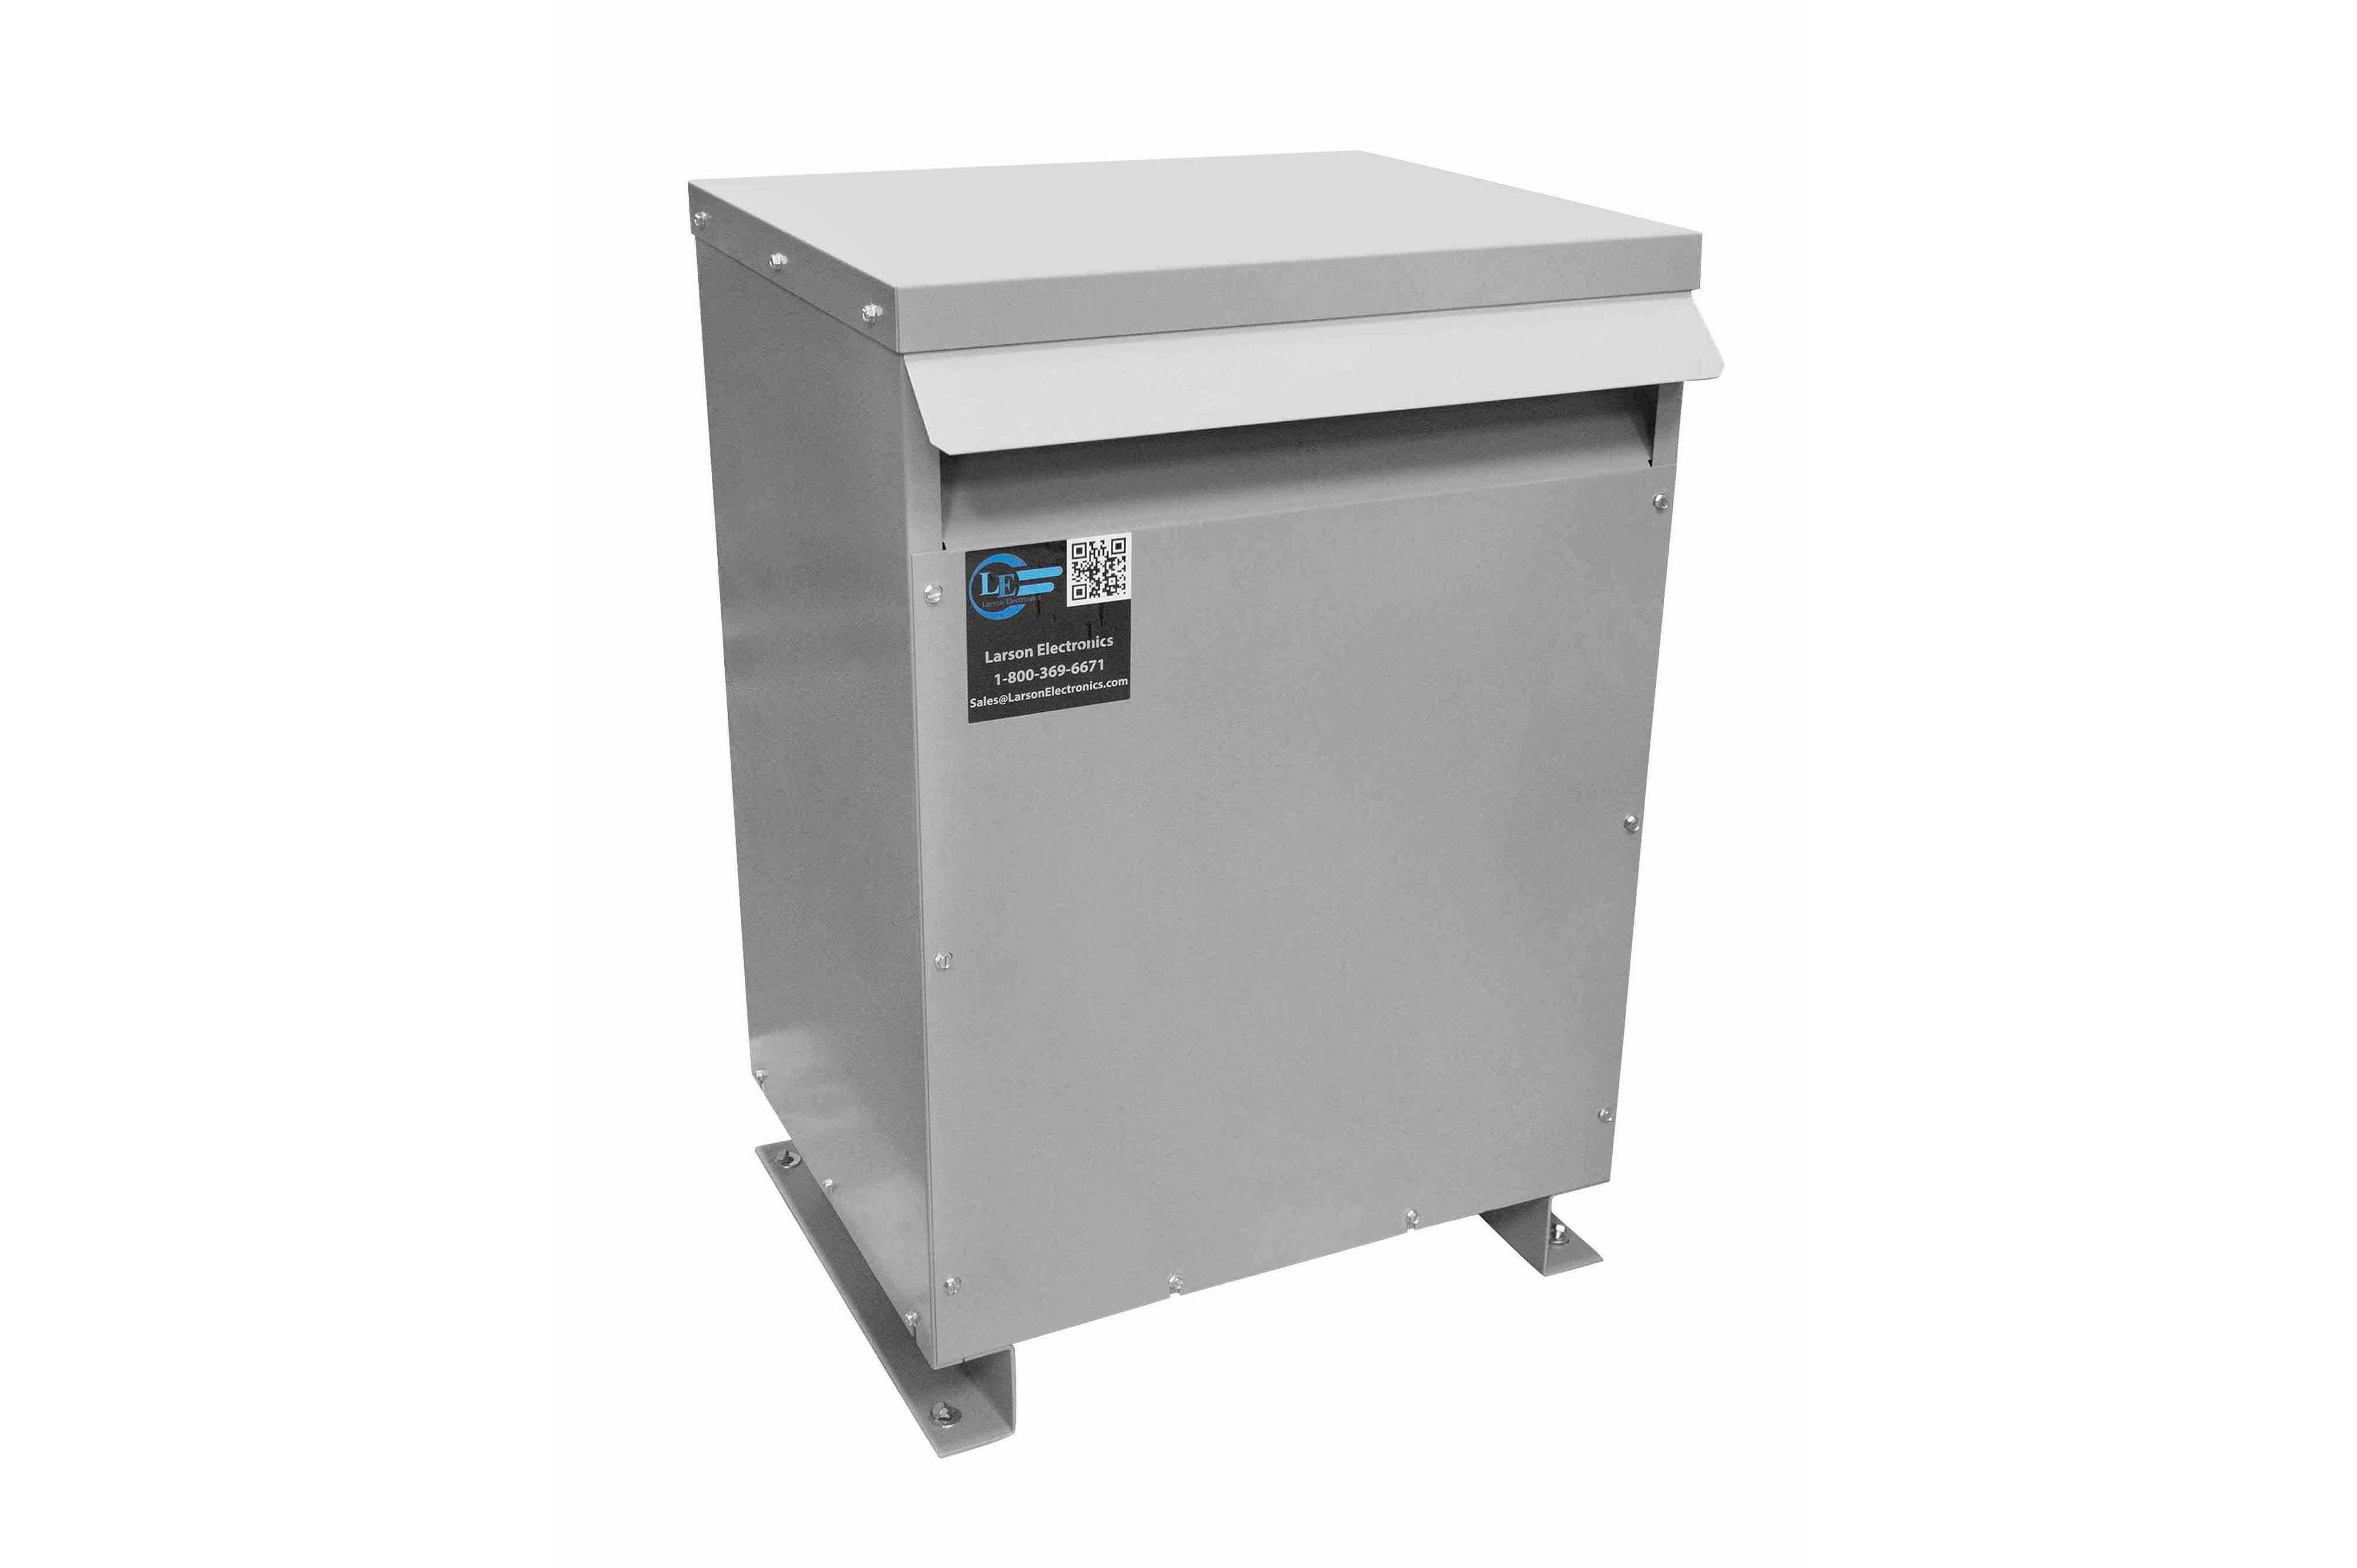 60 kVA 3PH Isolation Transformer, 415V Wye Primary, 600Y/347 Wye-N Secondary, N3R, Ventilated, 60 Hz